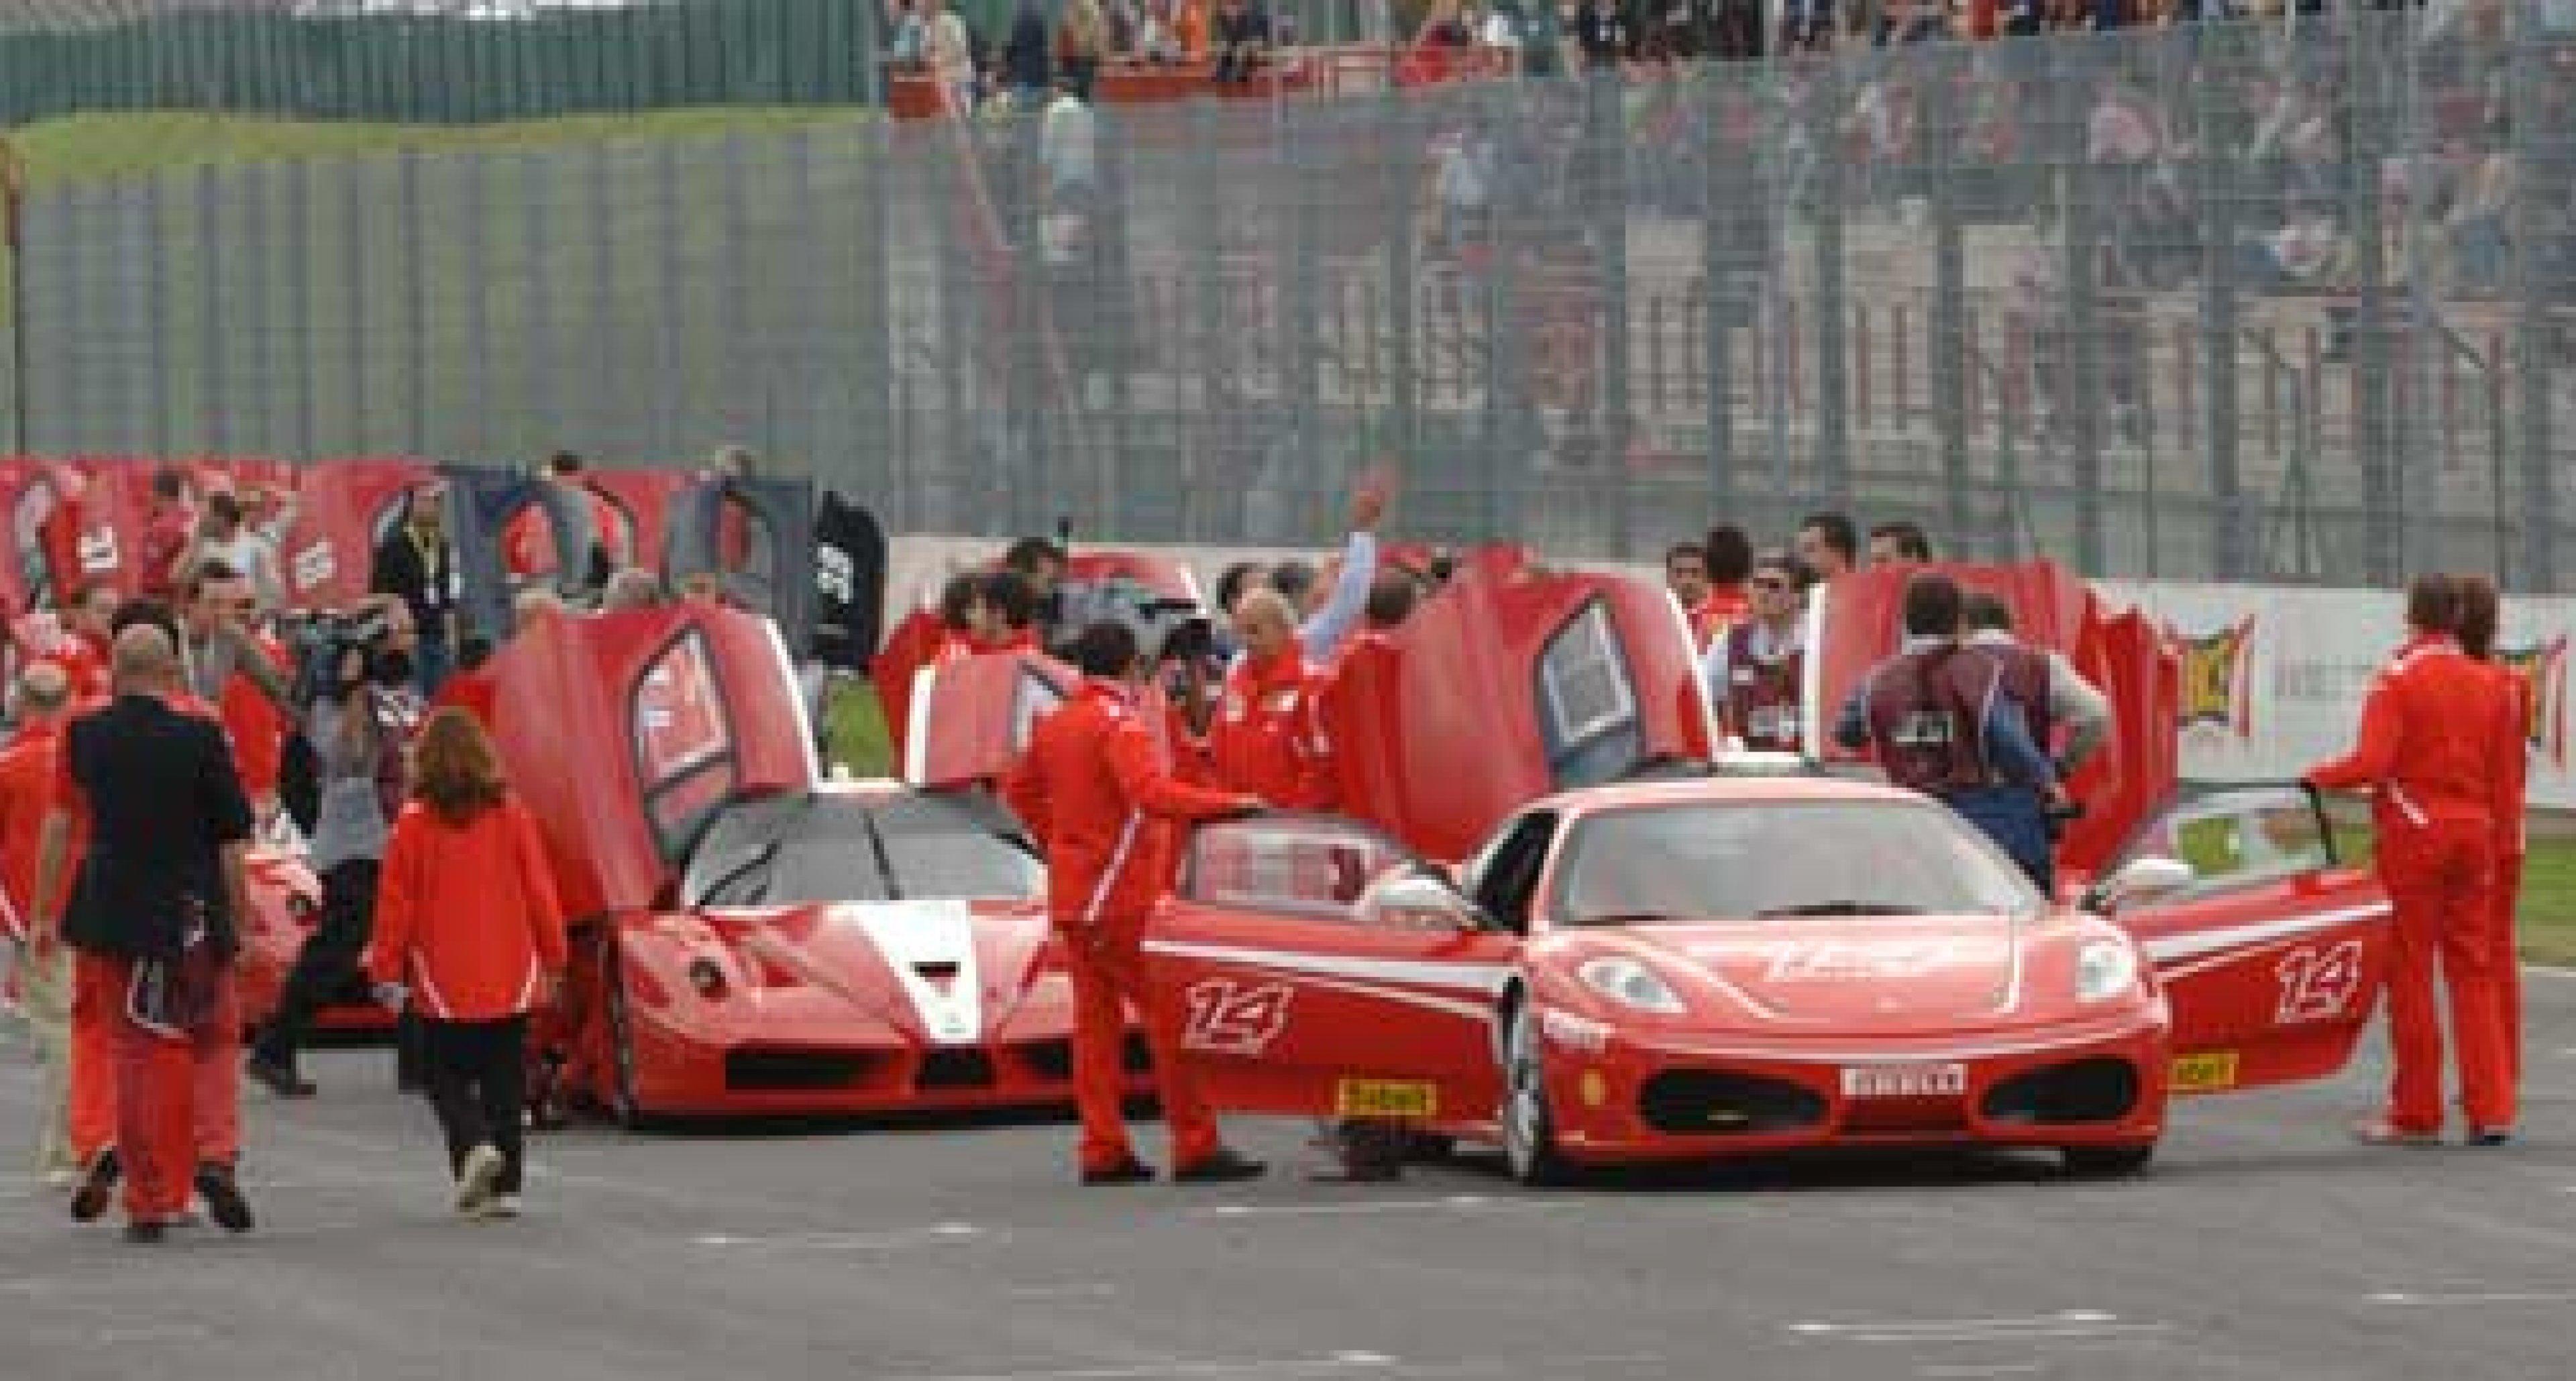 The 'Finali Mondiali' at Mugello 2005